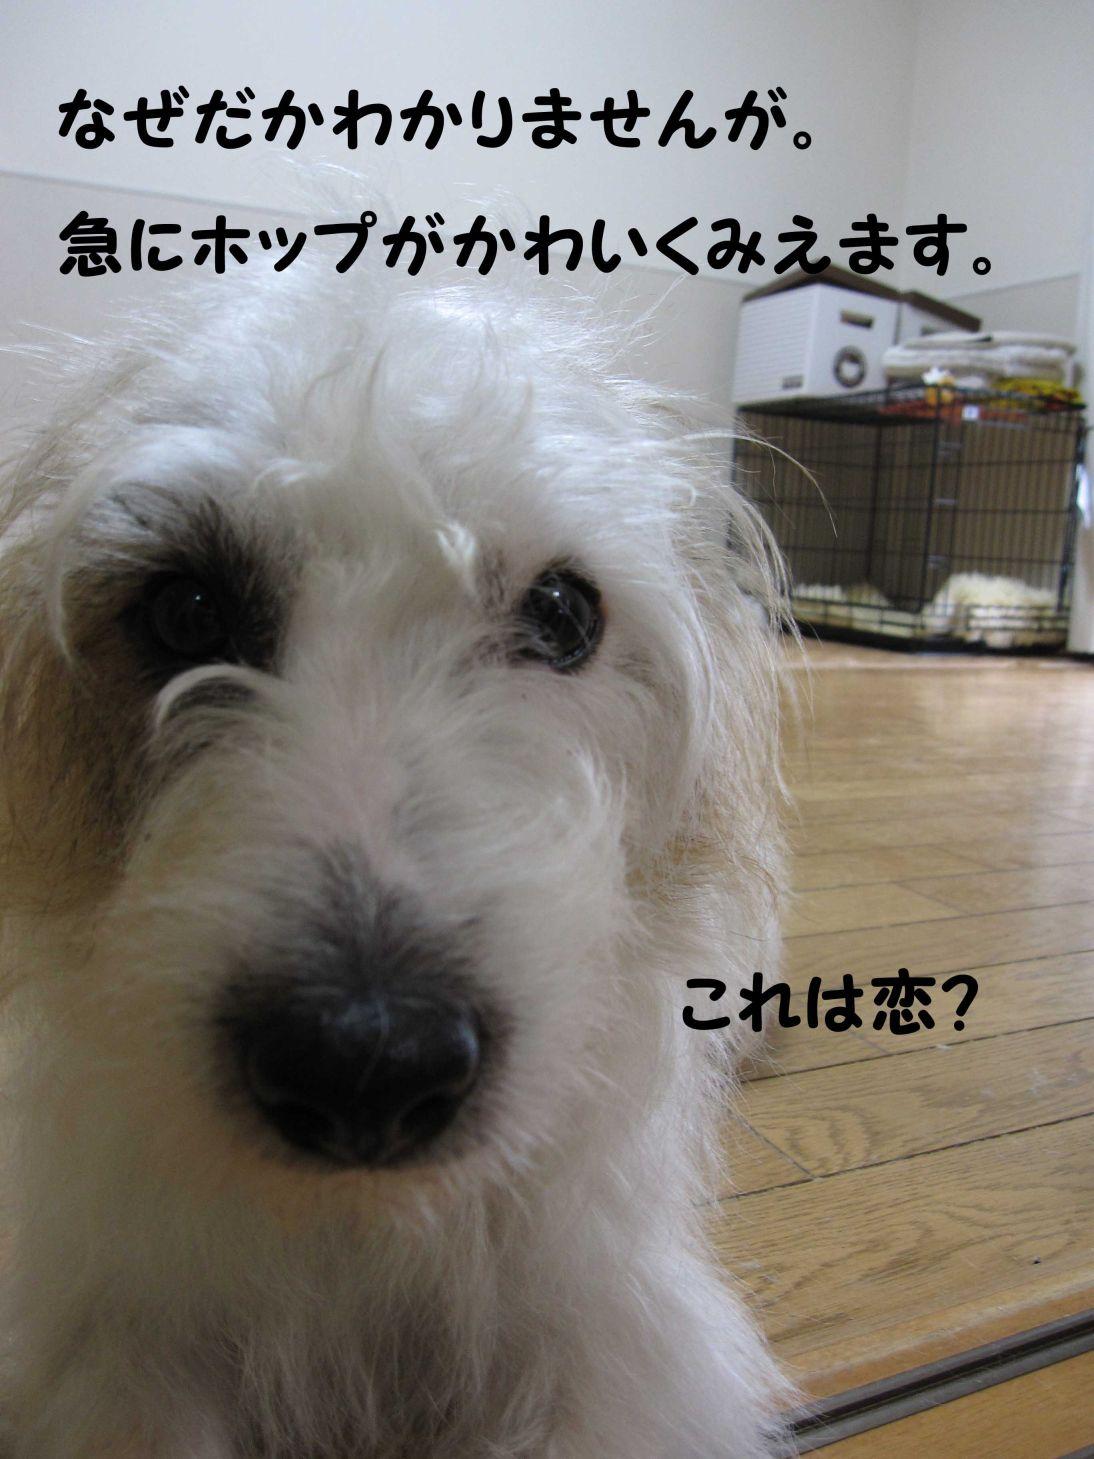 s_ラオホ 恋